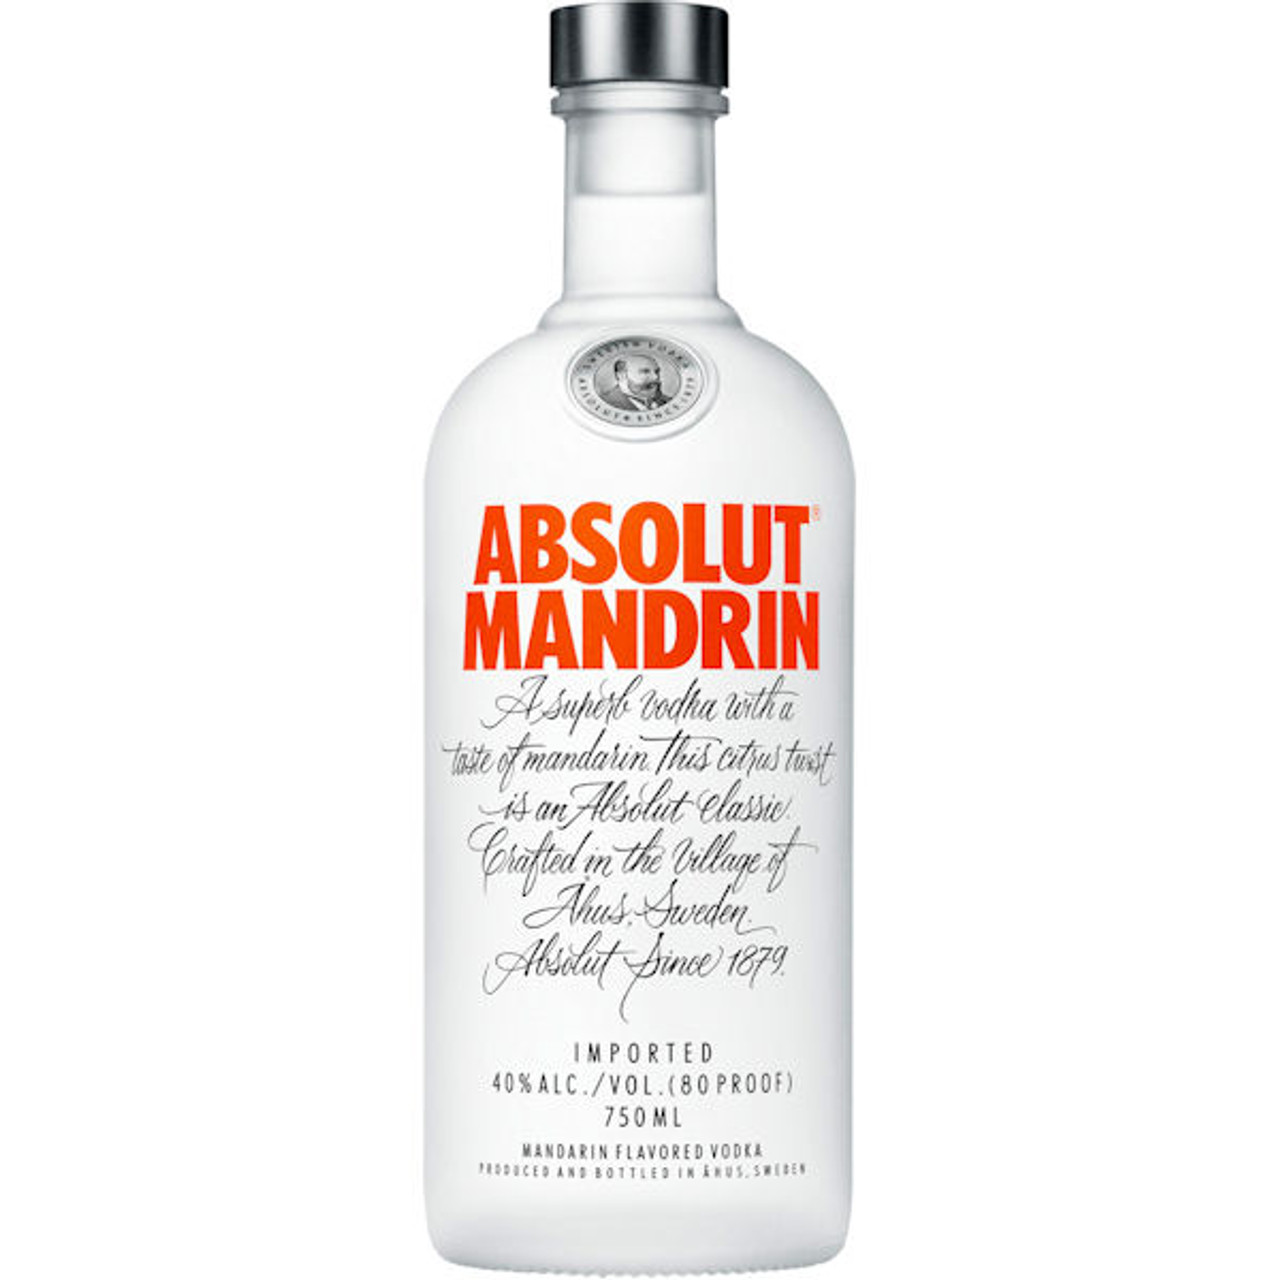 Absolut Mandrin Swedish Grain Vodka 750ml Rated 90-95